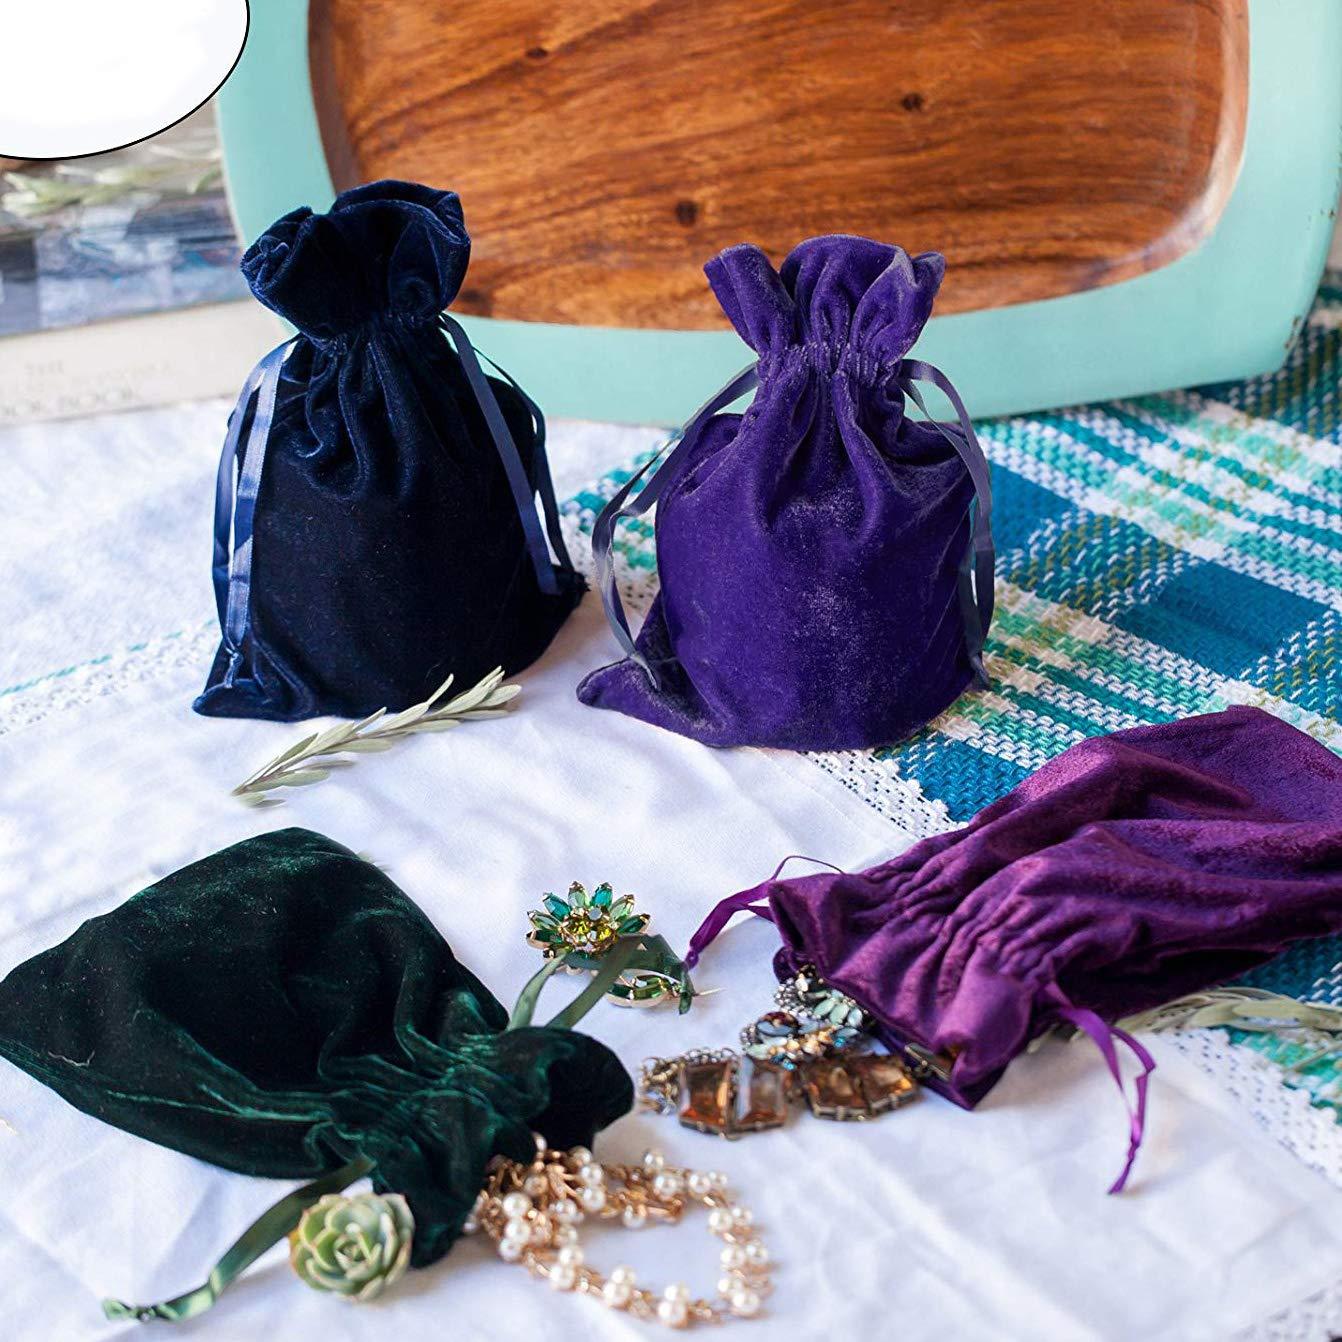 Huji Luxurious Cloth Velvet Soft Tarot Magic Drawstring Bags Jewelry Pouch Bags Tarot Card Size Dice Bags Bundle of 4: Moss Green 1, Pack of 4 Purple and Indigo 6 X 9 Navy Blue